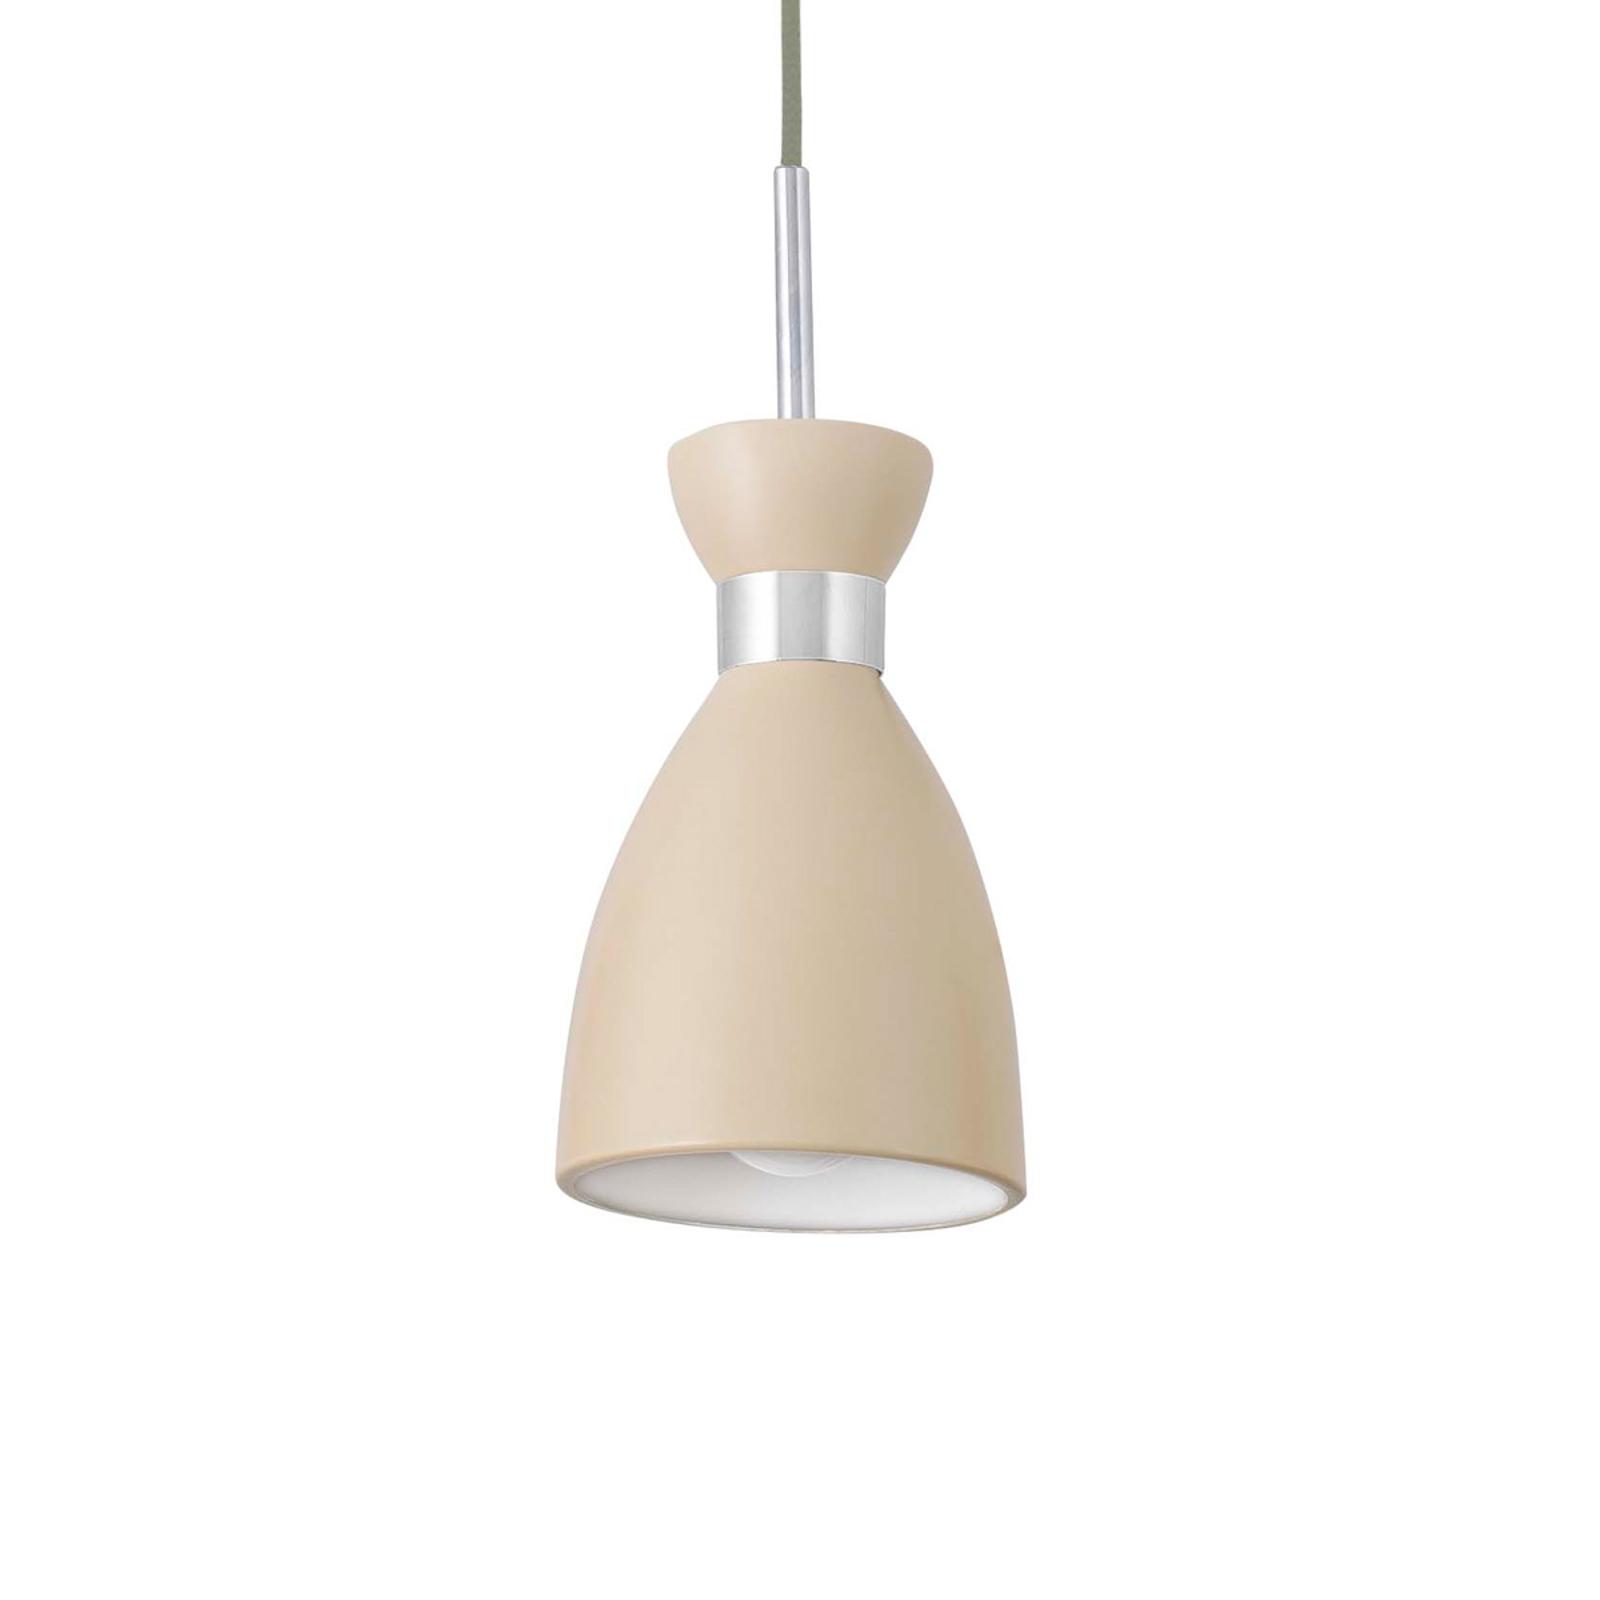 Beżowa lampa wisząca Retro